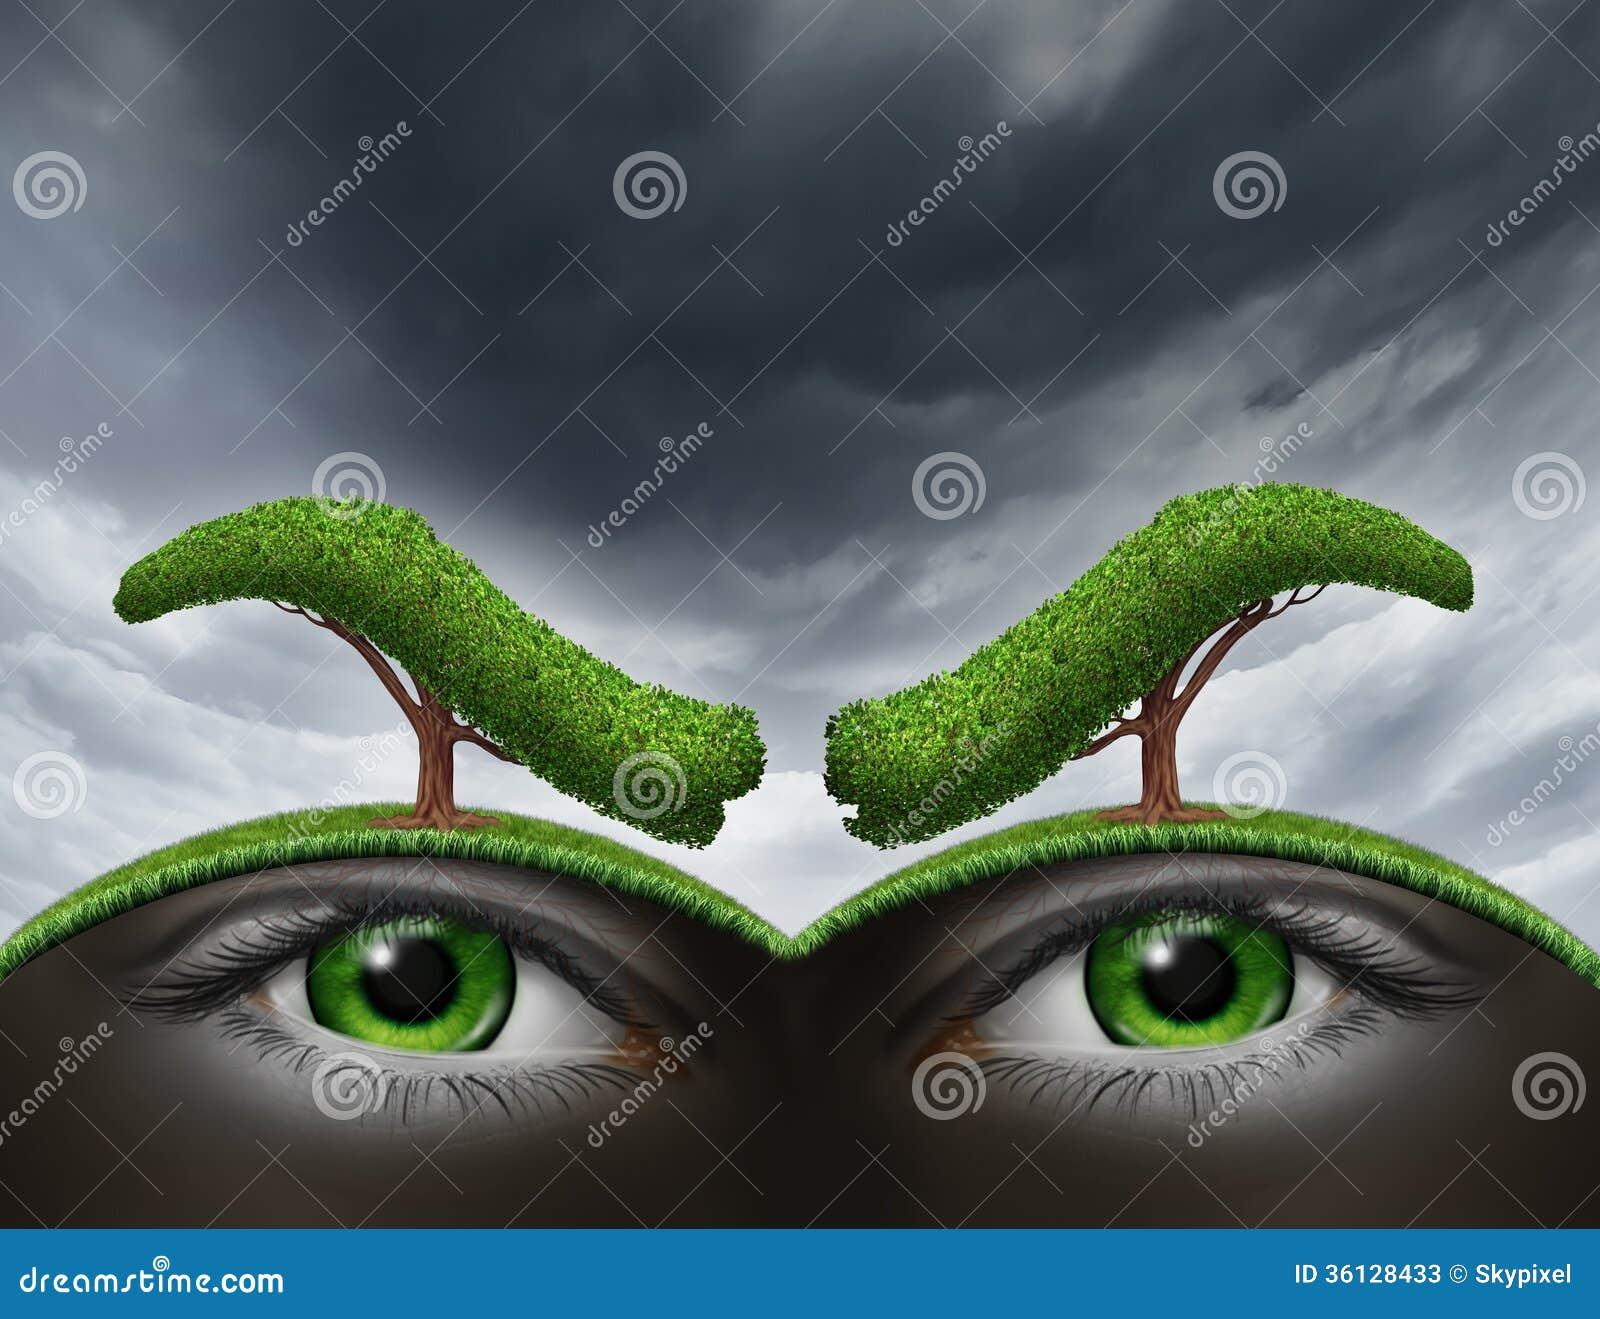 Man-made Environmental Issues–Hypoxia